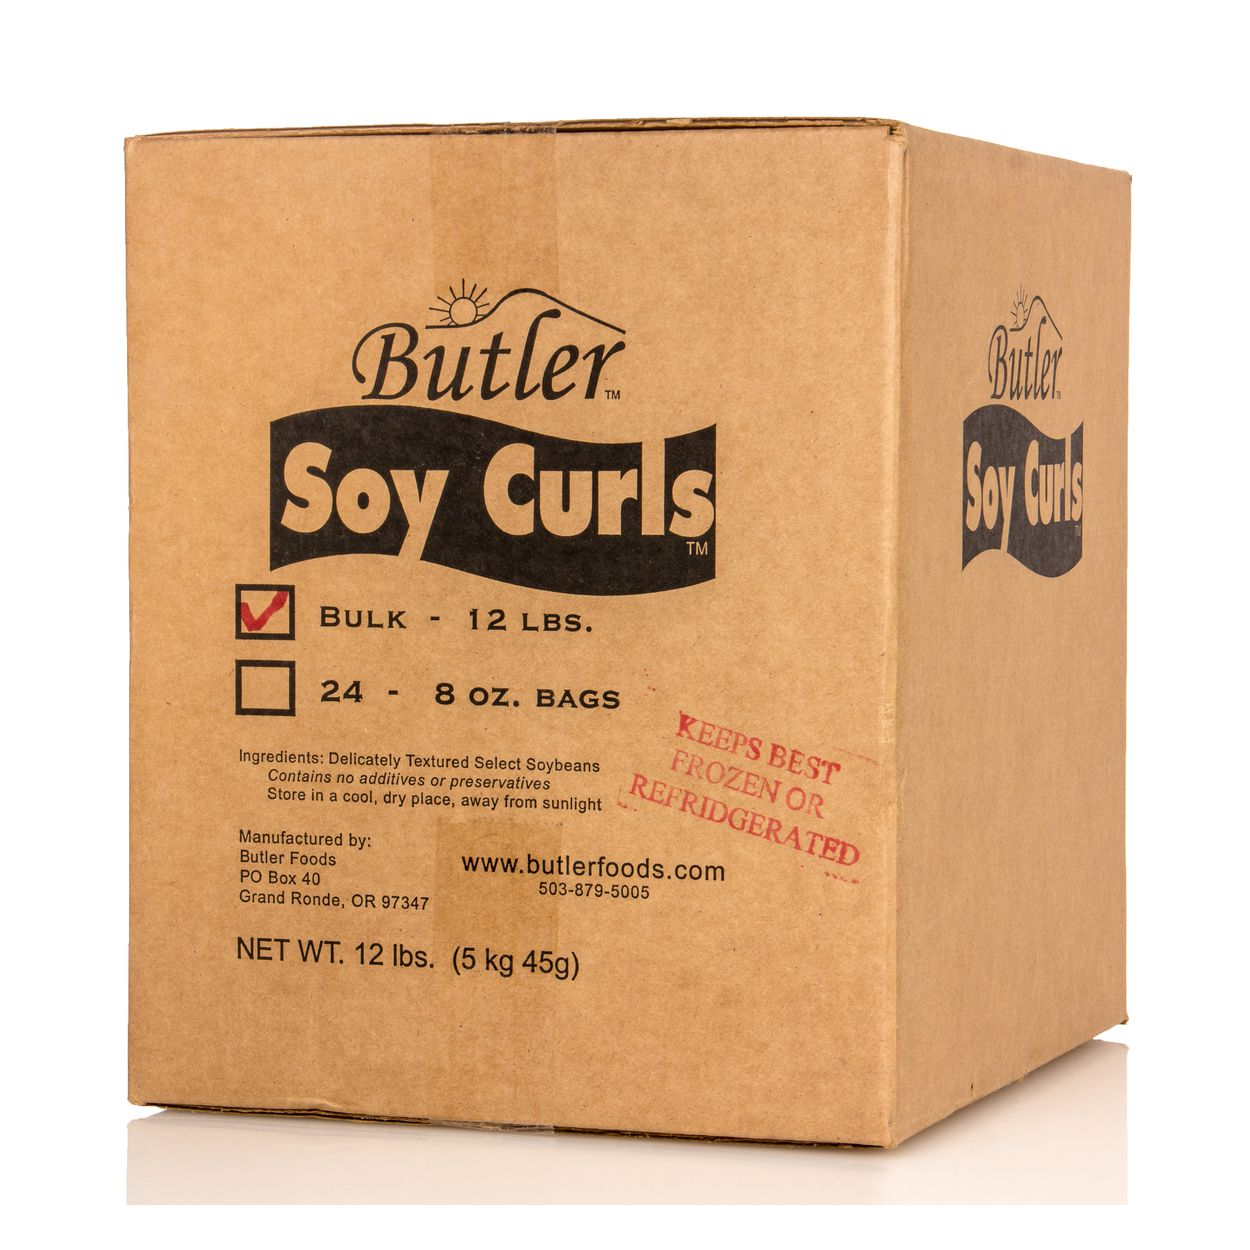 Butler Foods - Soy CURLS, Bulk, GMO